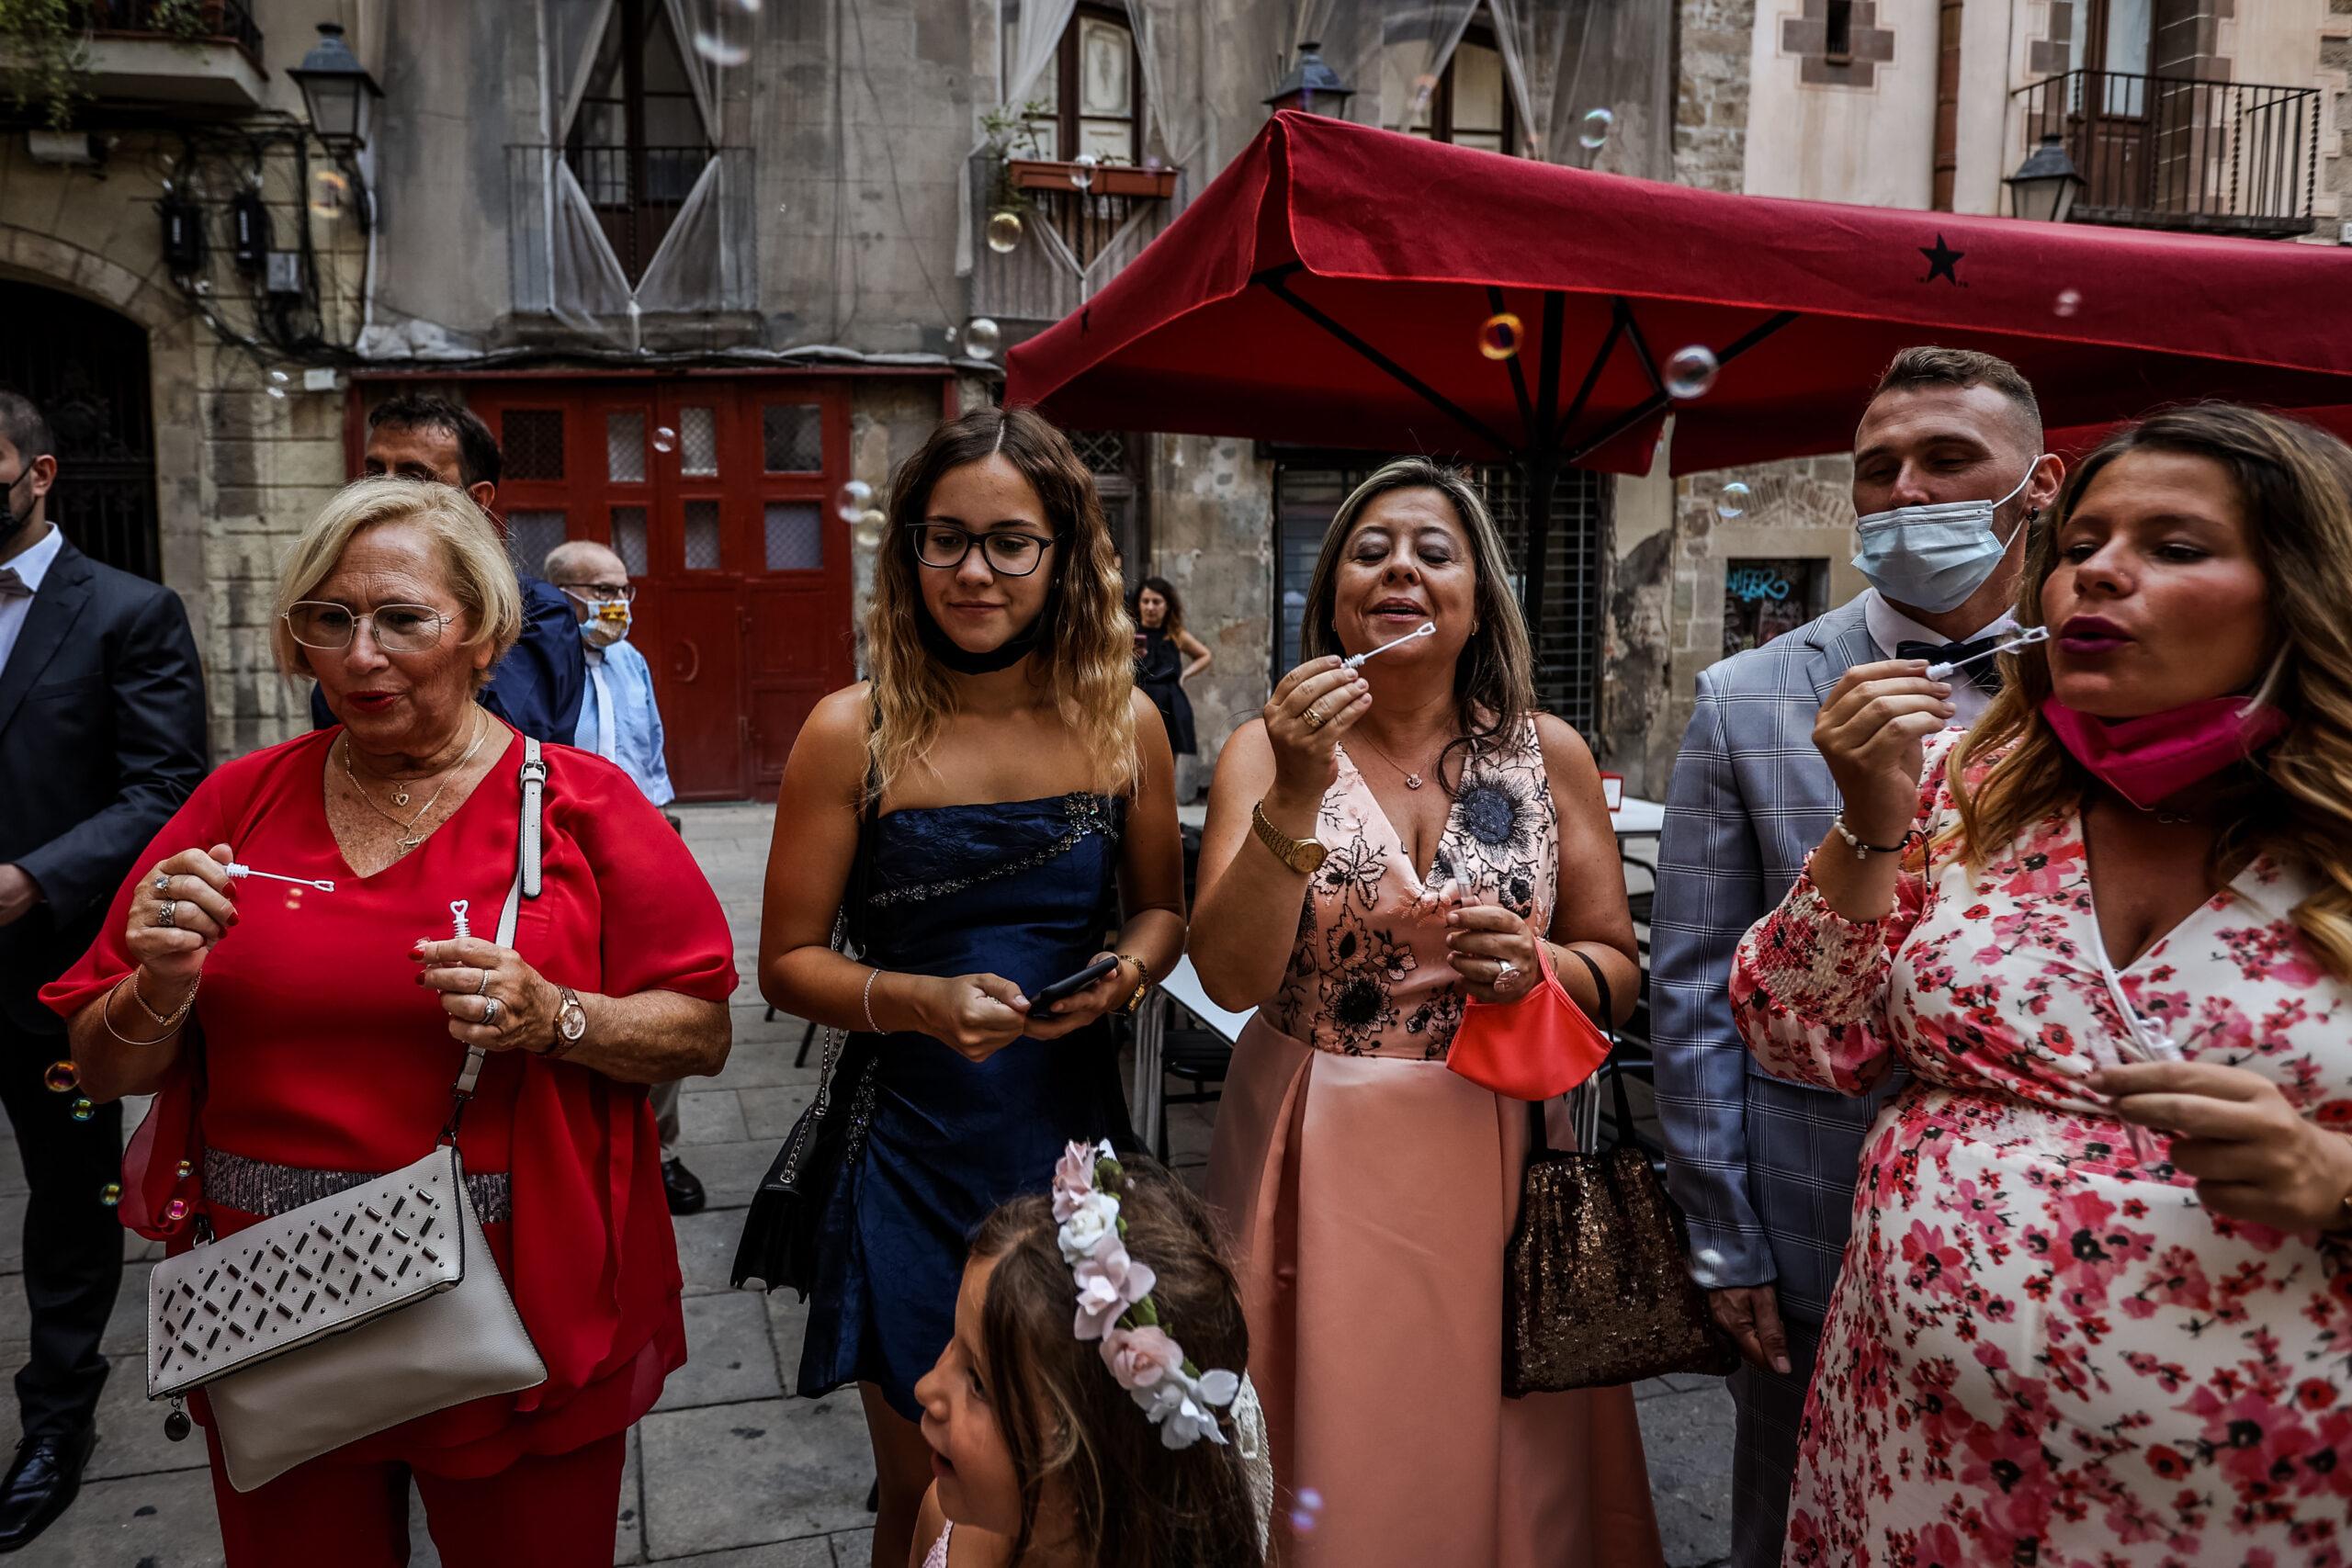 boda barcelona, barcelona boda, wedding barcelona, get married barcelona, barcelona wedding planner, barcelona wedding day, wedding planner, wedding inspo, wedding inspiration,wedding decor, traditional wedding, real wedding, wedding day, bride, groom, happiness, family, love, kids, cool, awesome